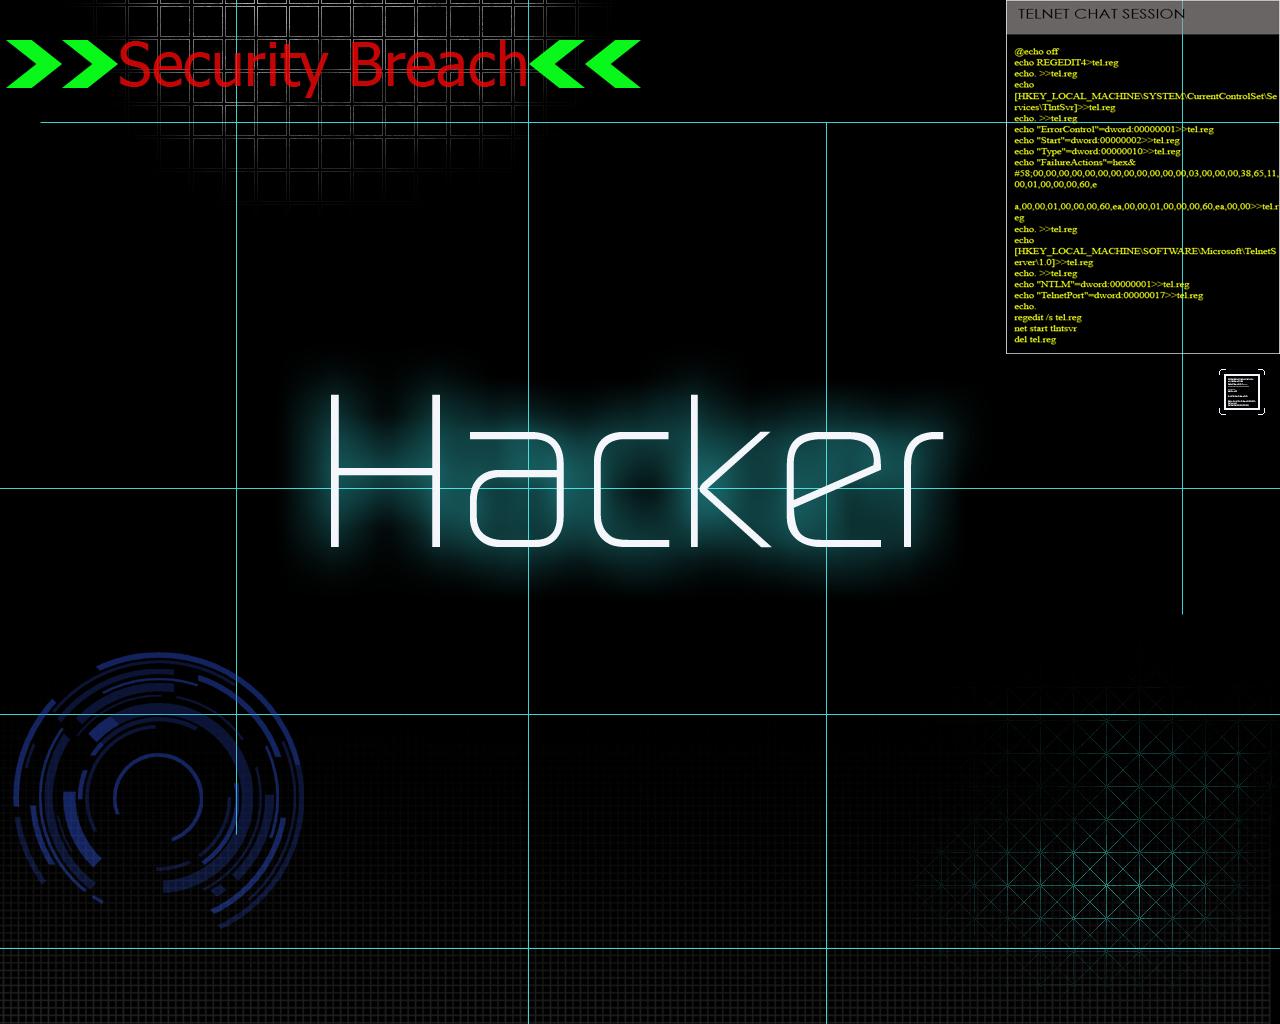 http://3.bp.blogspot.com/-FKOxcn9tNDg/UEpAzTRlOfI/AAAAAAAAAV0/pdI-Jlr7-Og/s1600/windows-update-hack.jpg